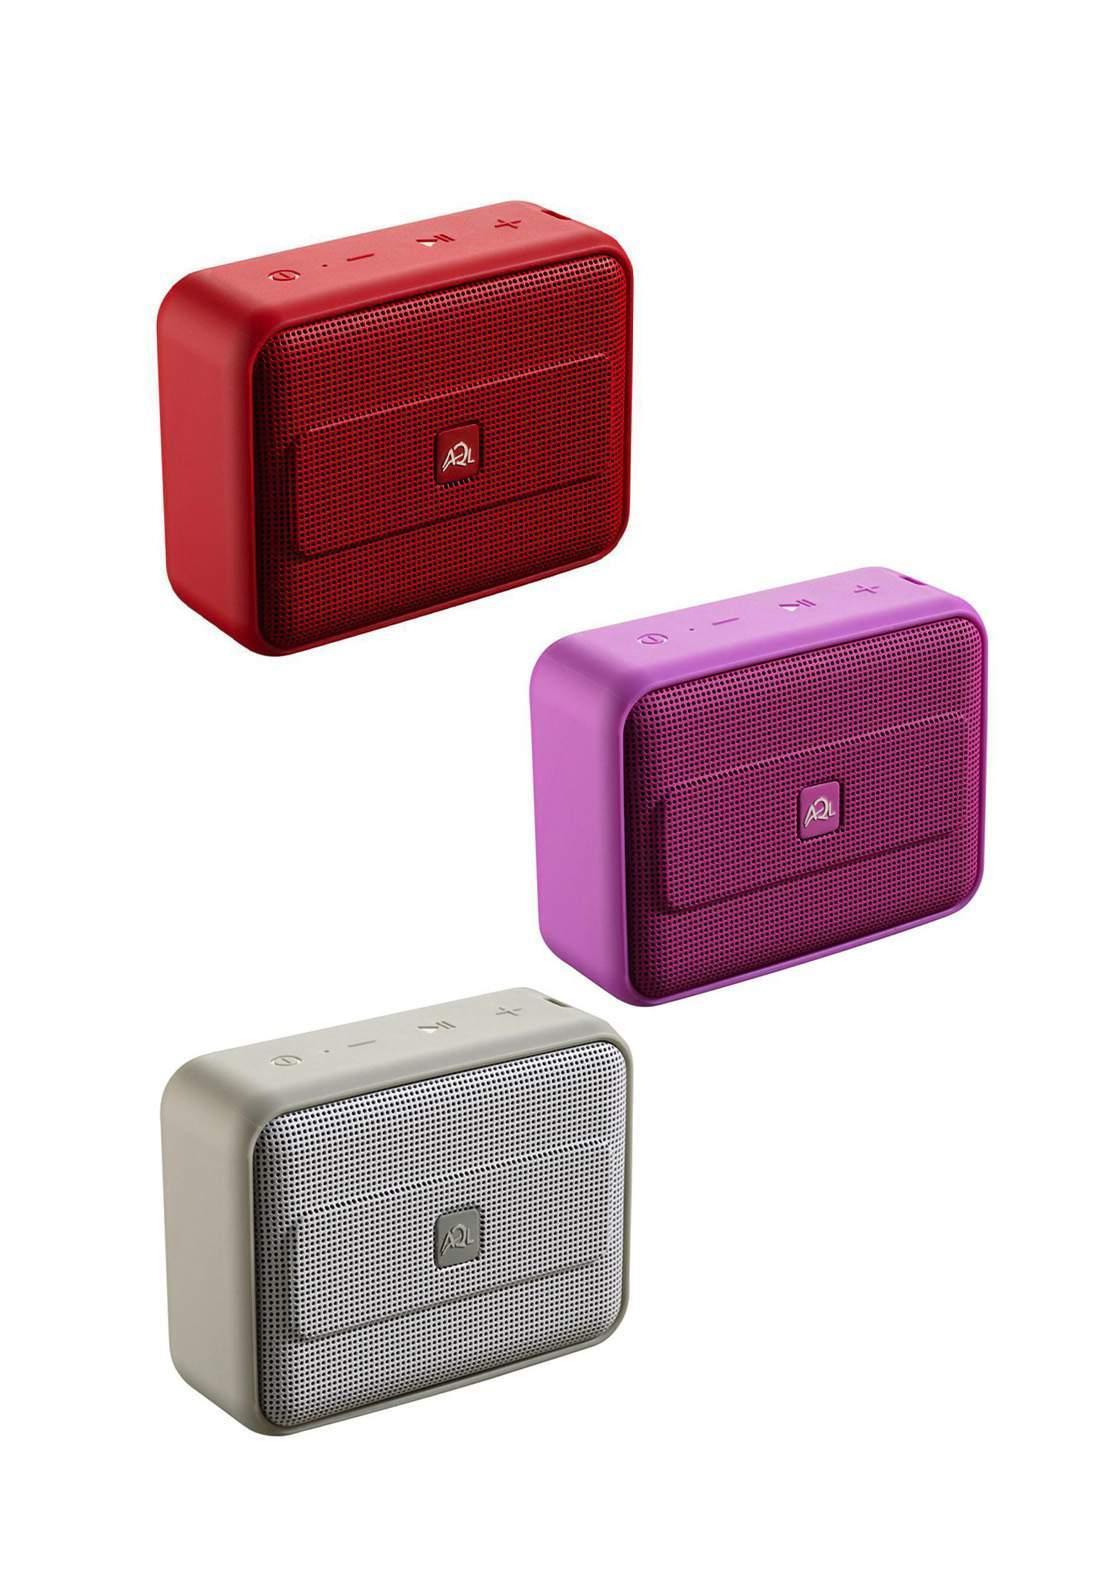 AQL Fizzy2 Wireless Bluetooth Portable Speaker مكبر صوت محمول